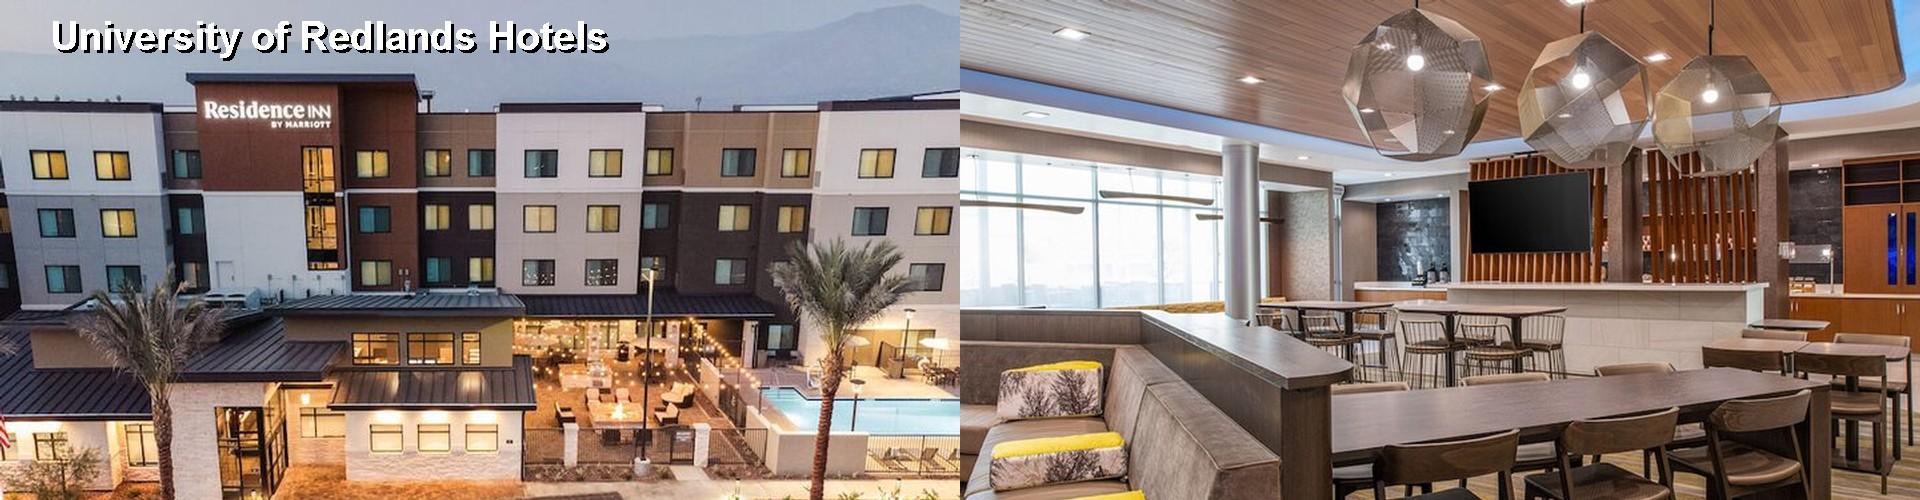 $46+ Hotels Near University of Redlands (CA)